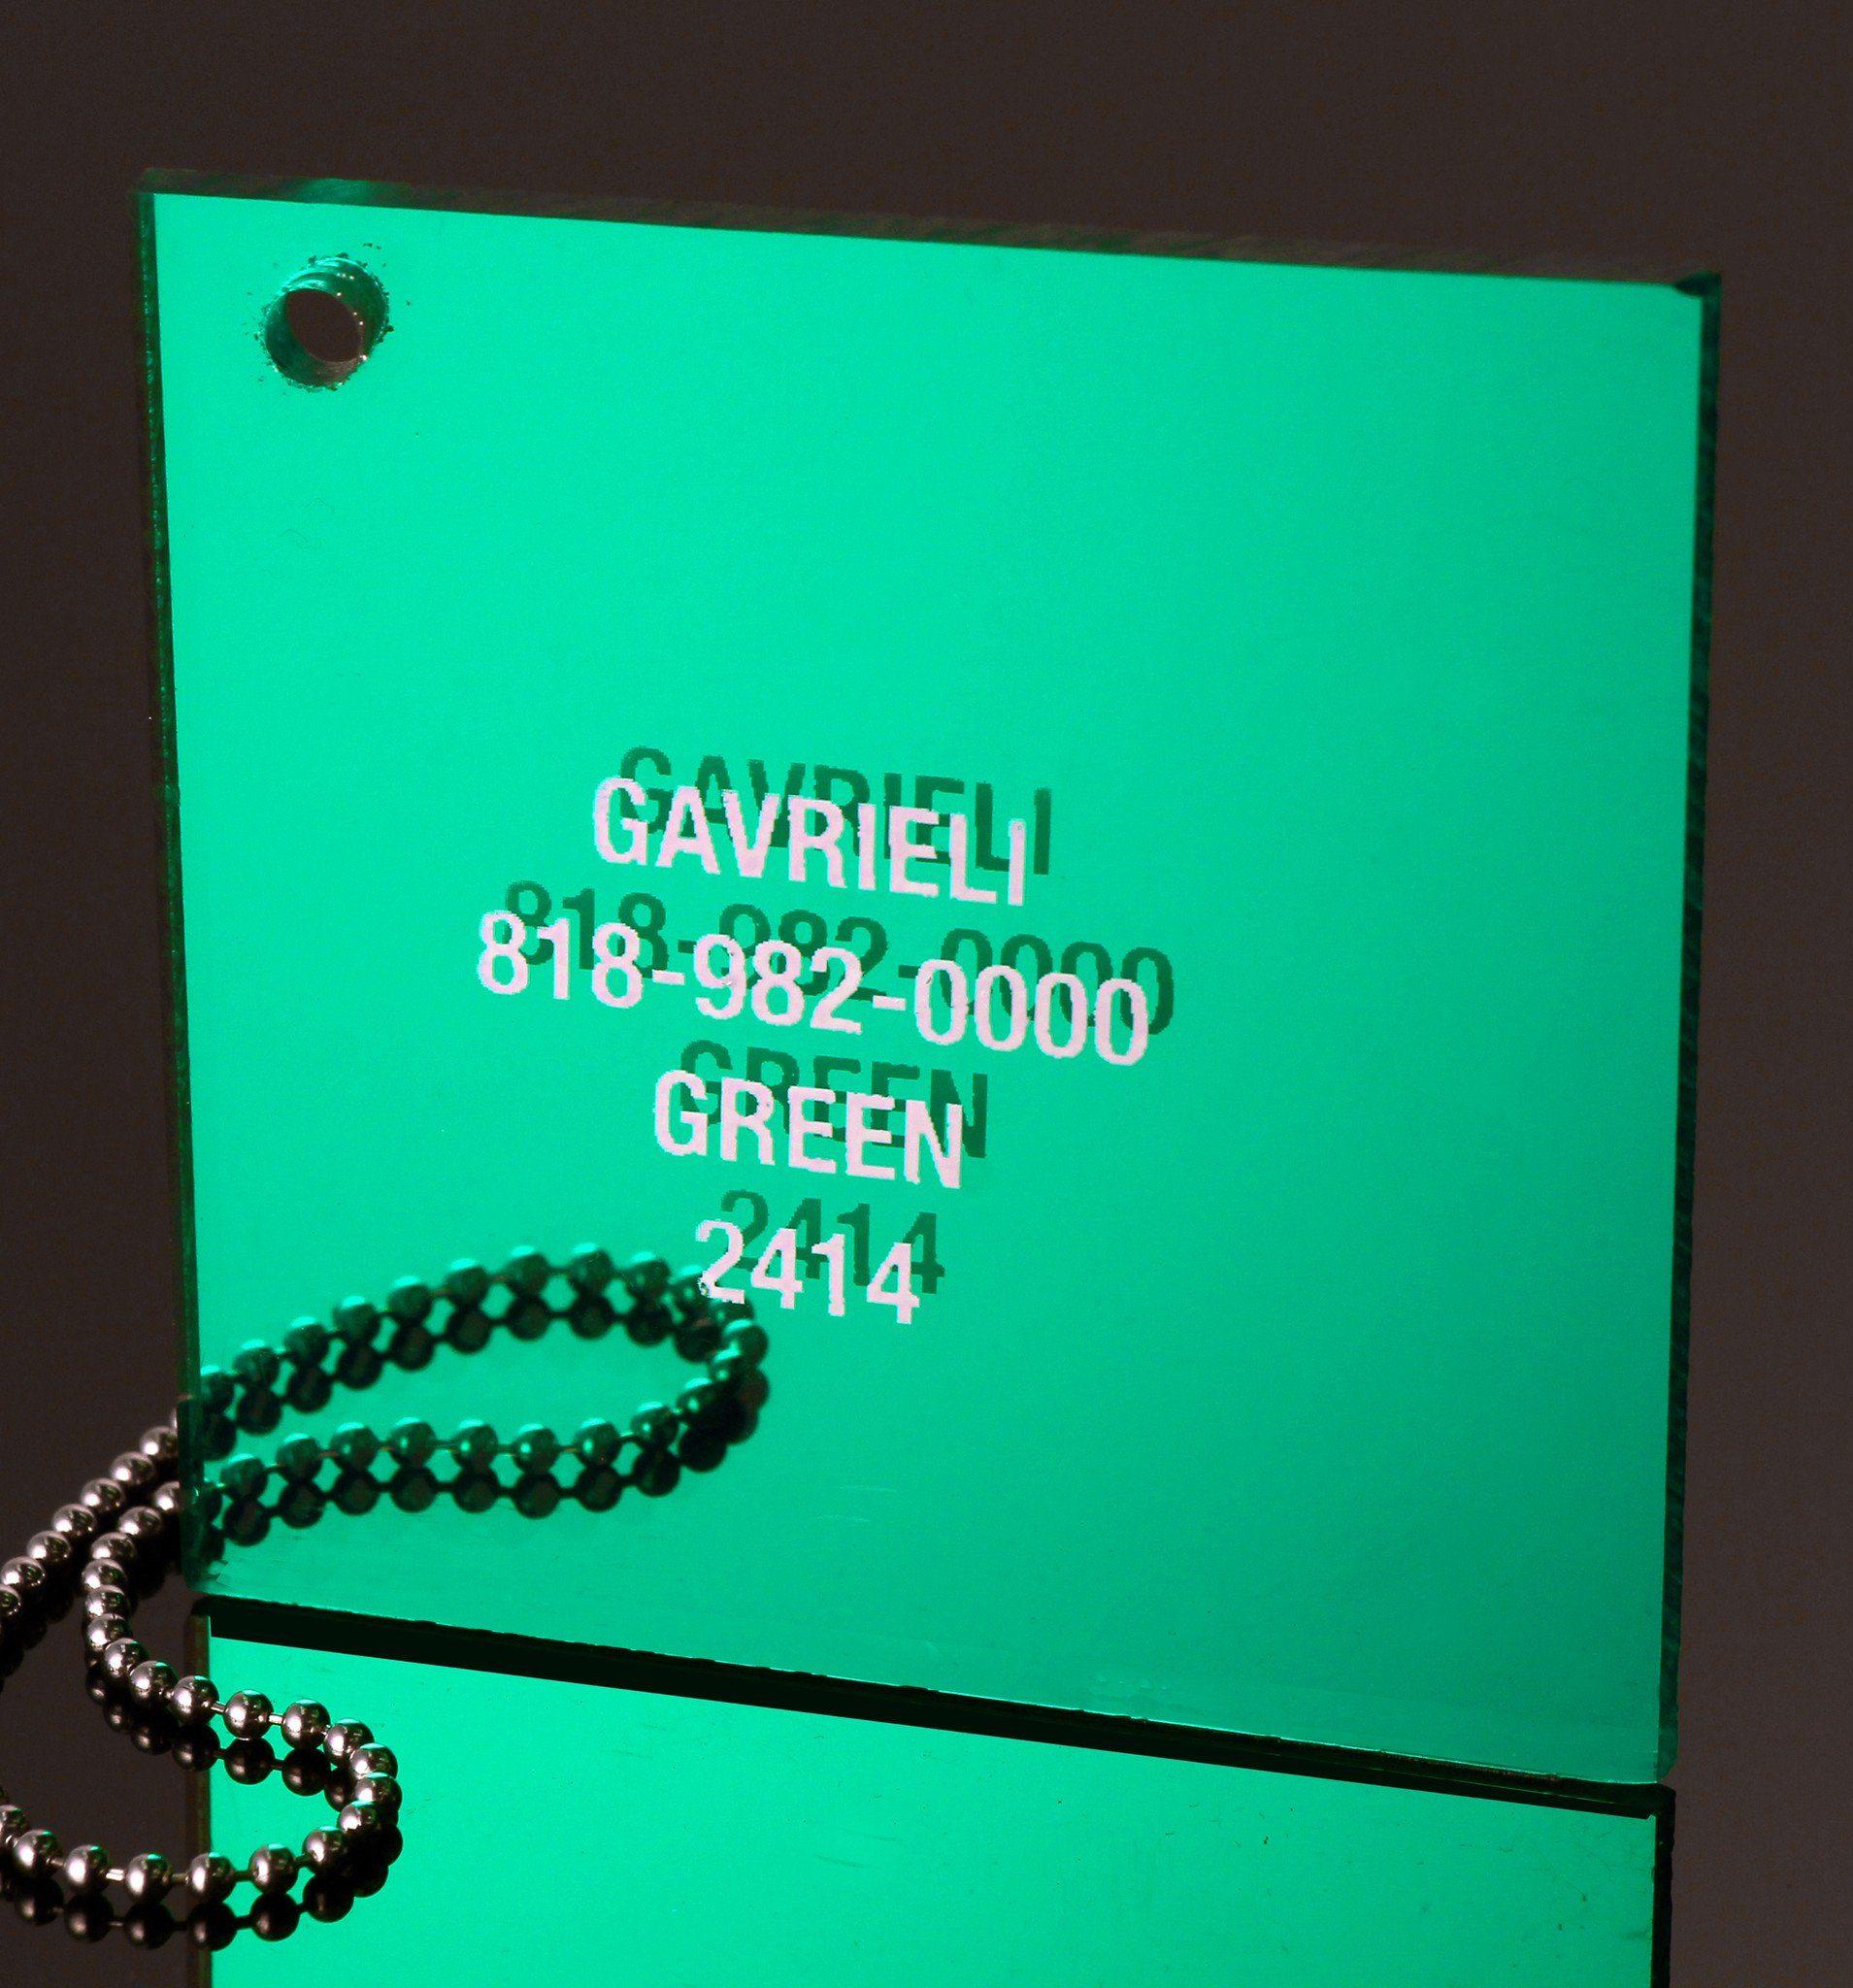 GREEN 2414